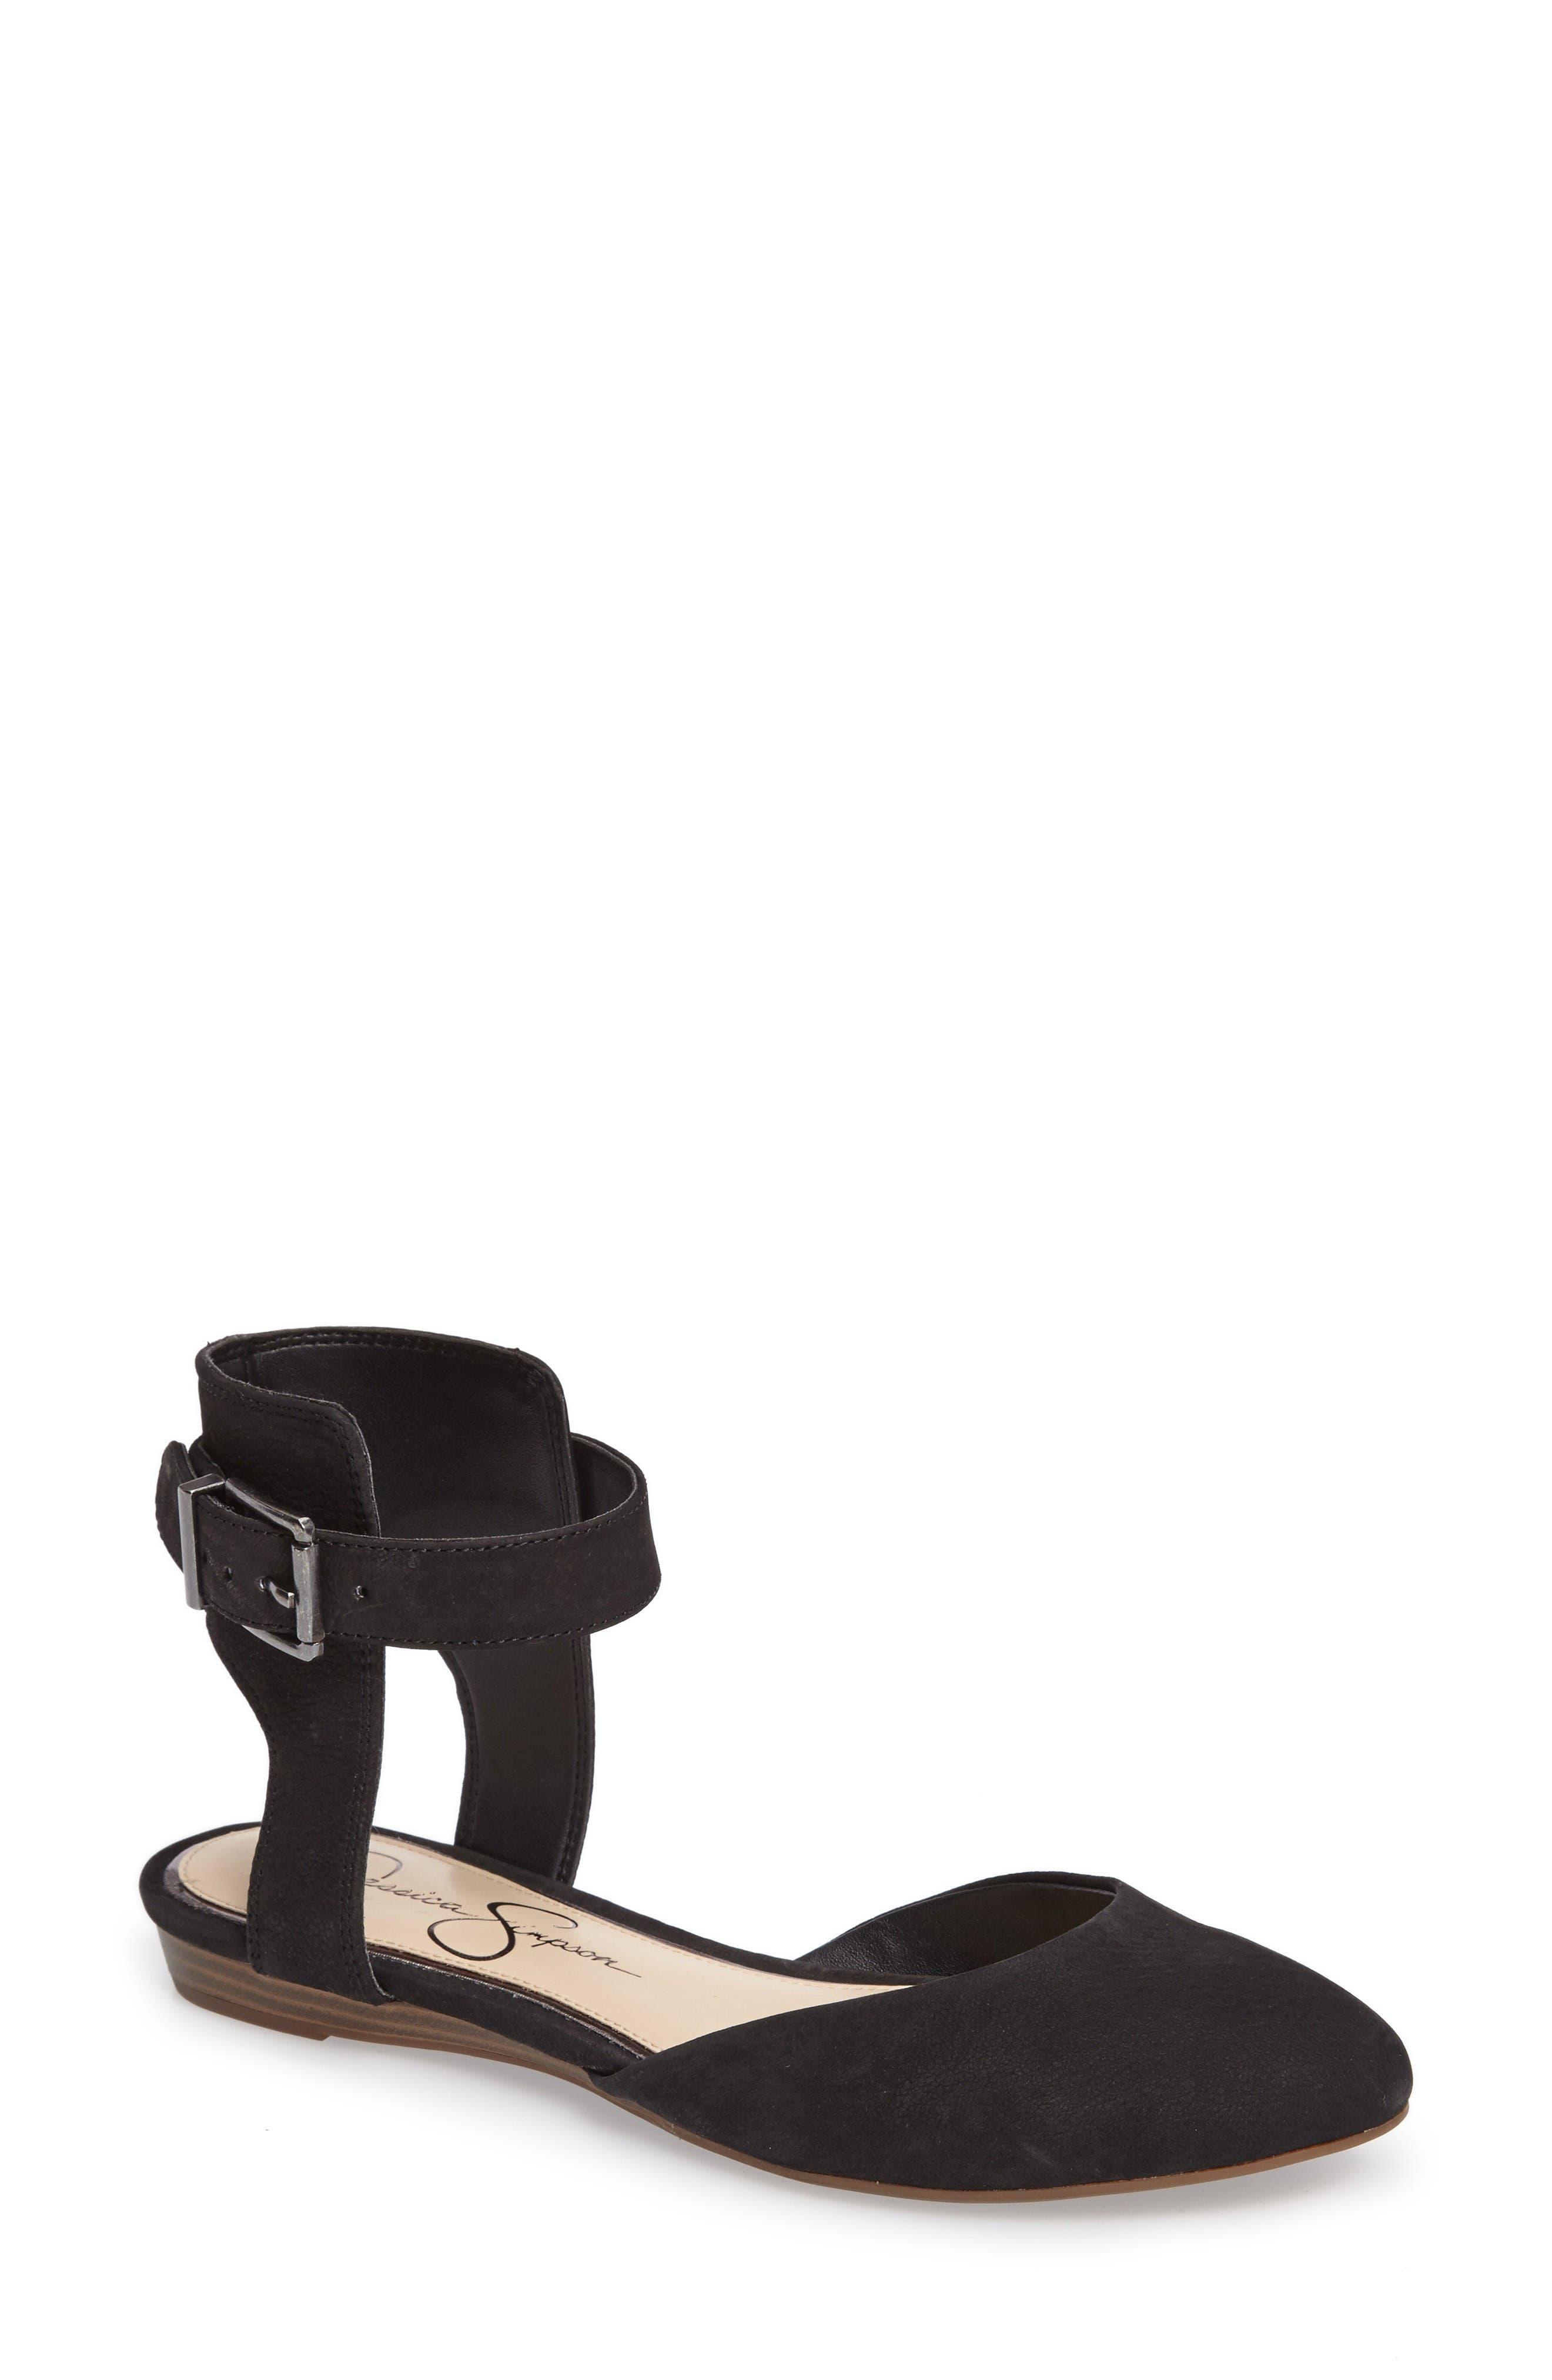 Alternate Image 1 Selected - Jessica Simpson Loranda Ankle Strap Flat (Women)